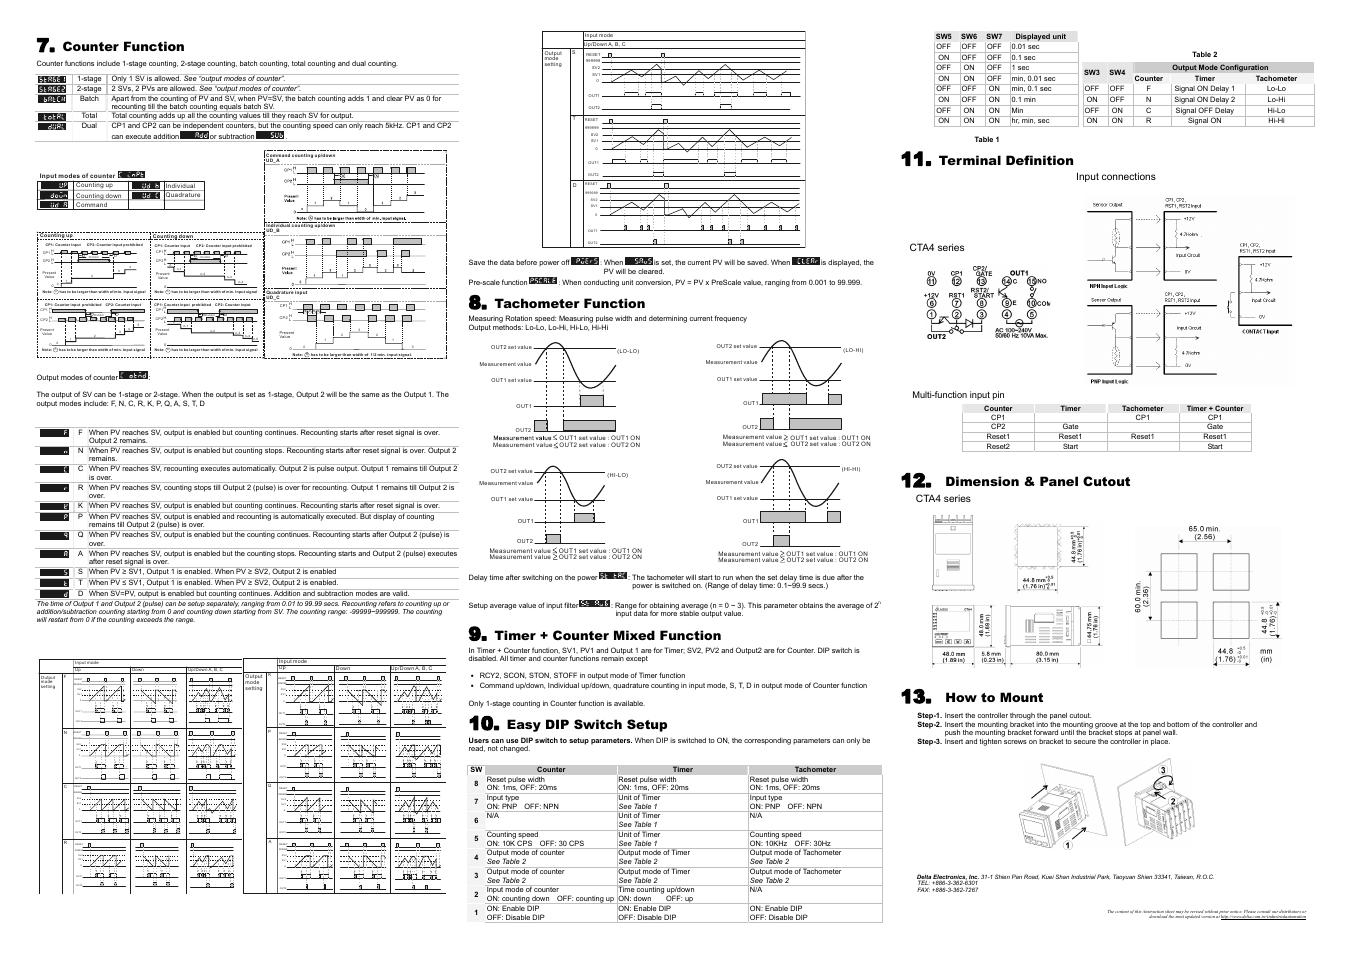 prohibit a a aprohibit a delta electronics timer counter rh manualsdir com Delta Electronics Fans Delta Electronics Power Supply